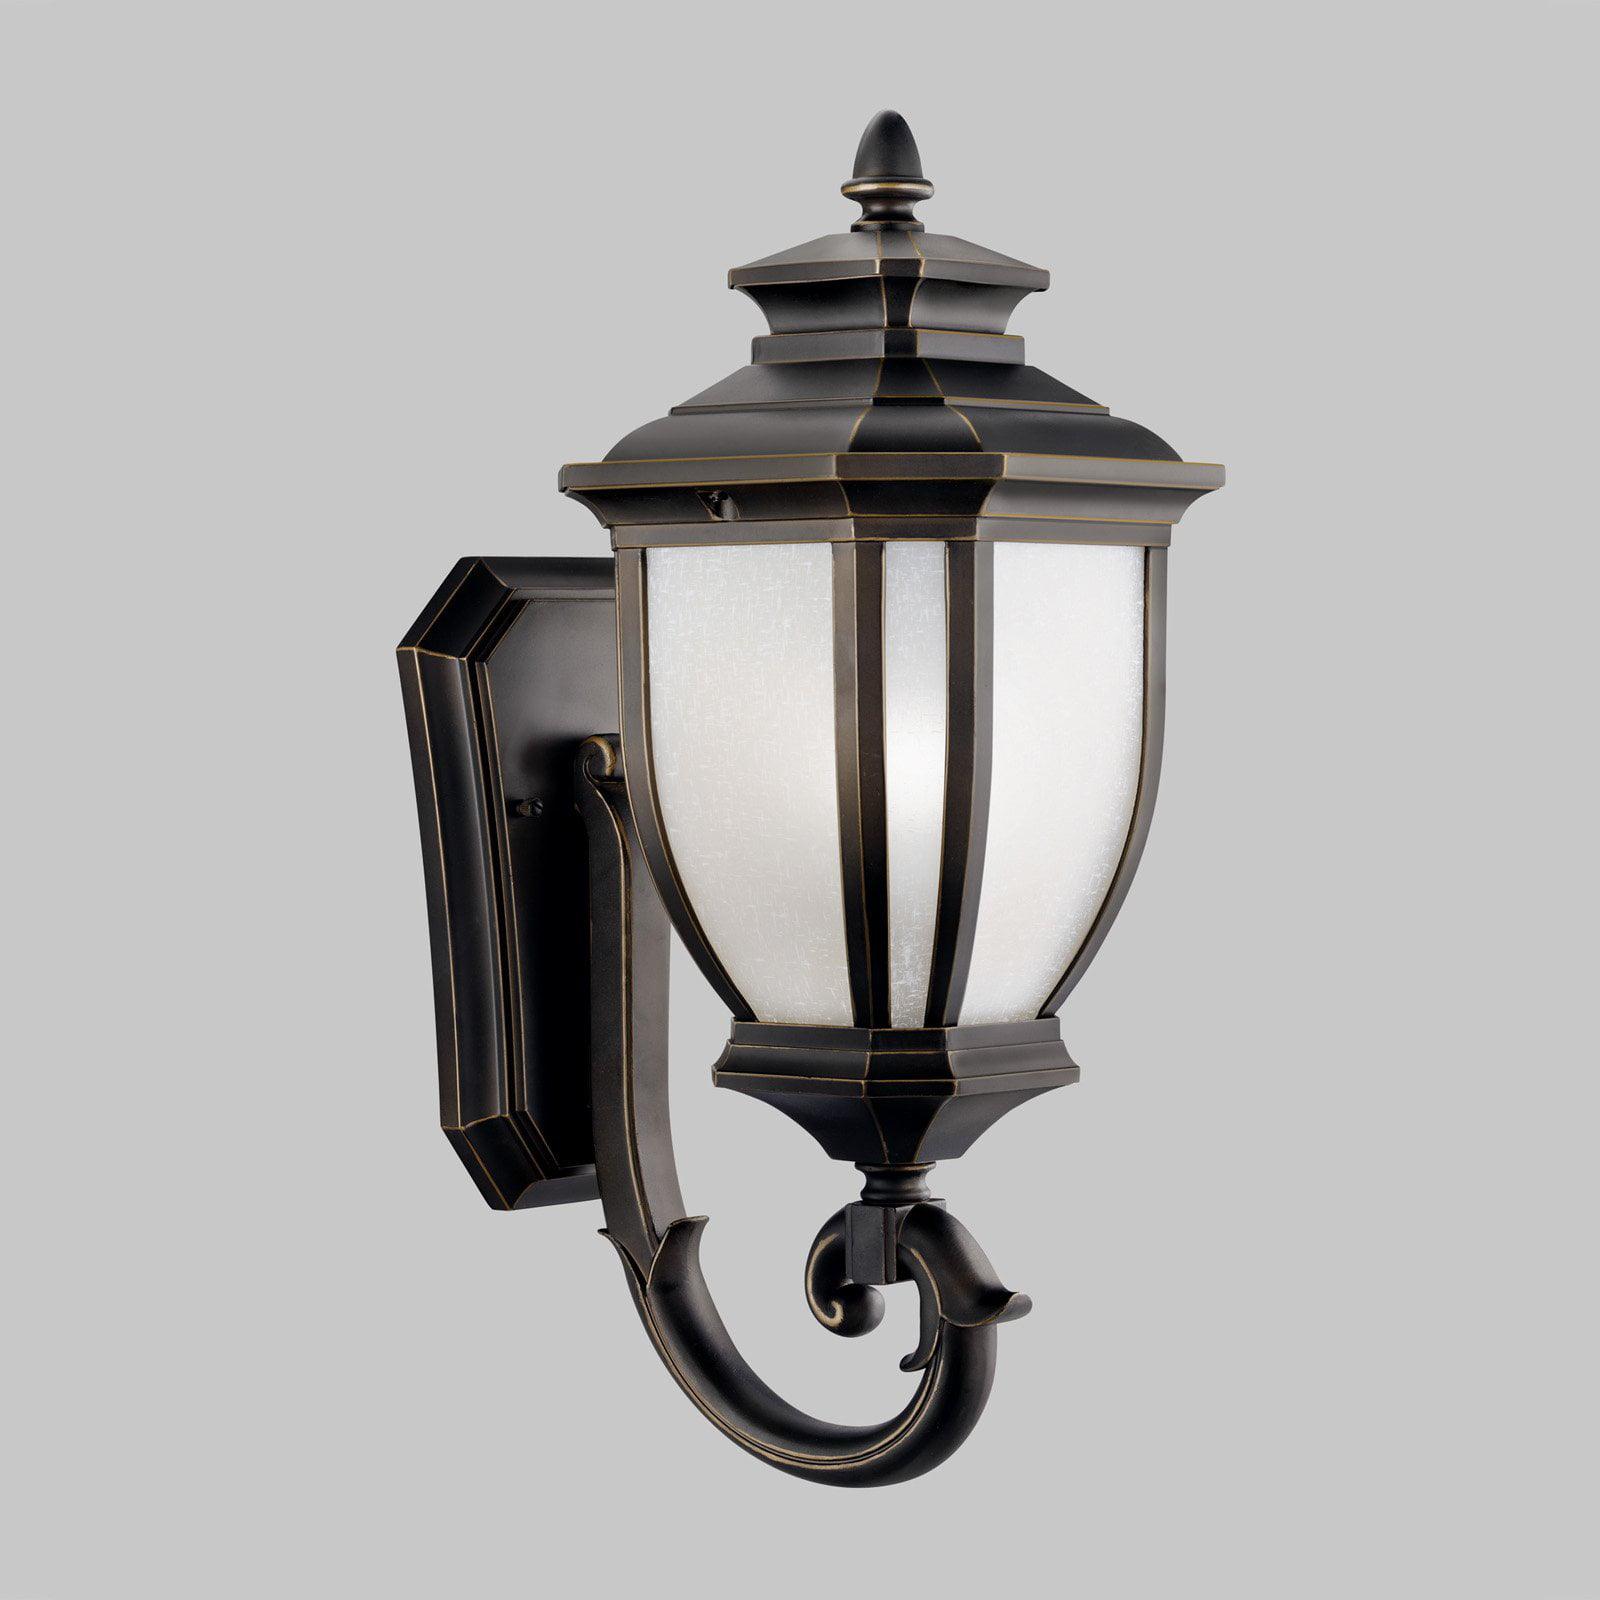 Kichler Salisbury 9041 Outdoor Wall Lantern - 8 in.